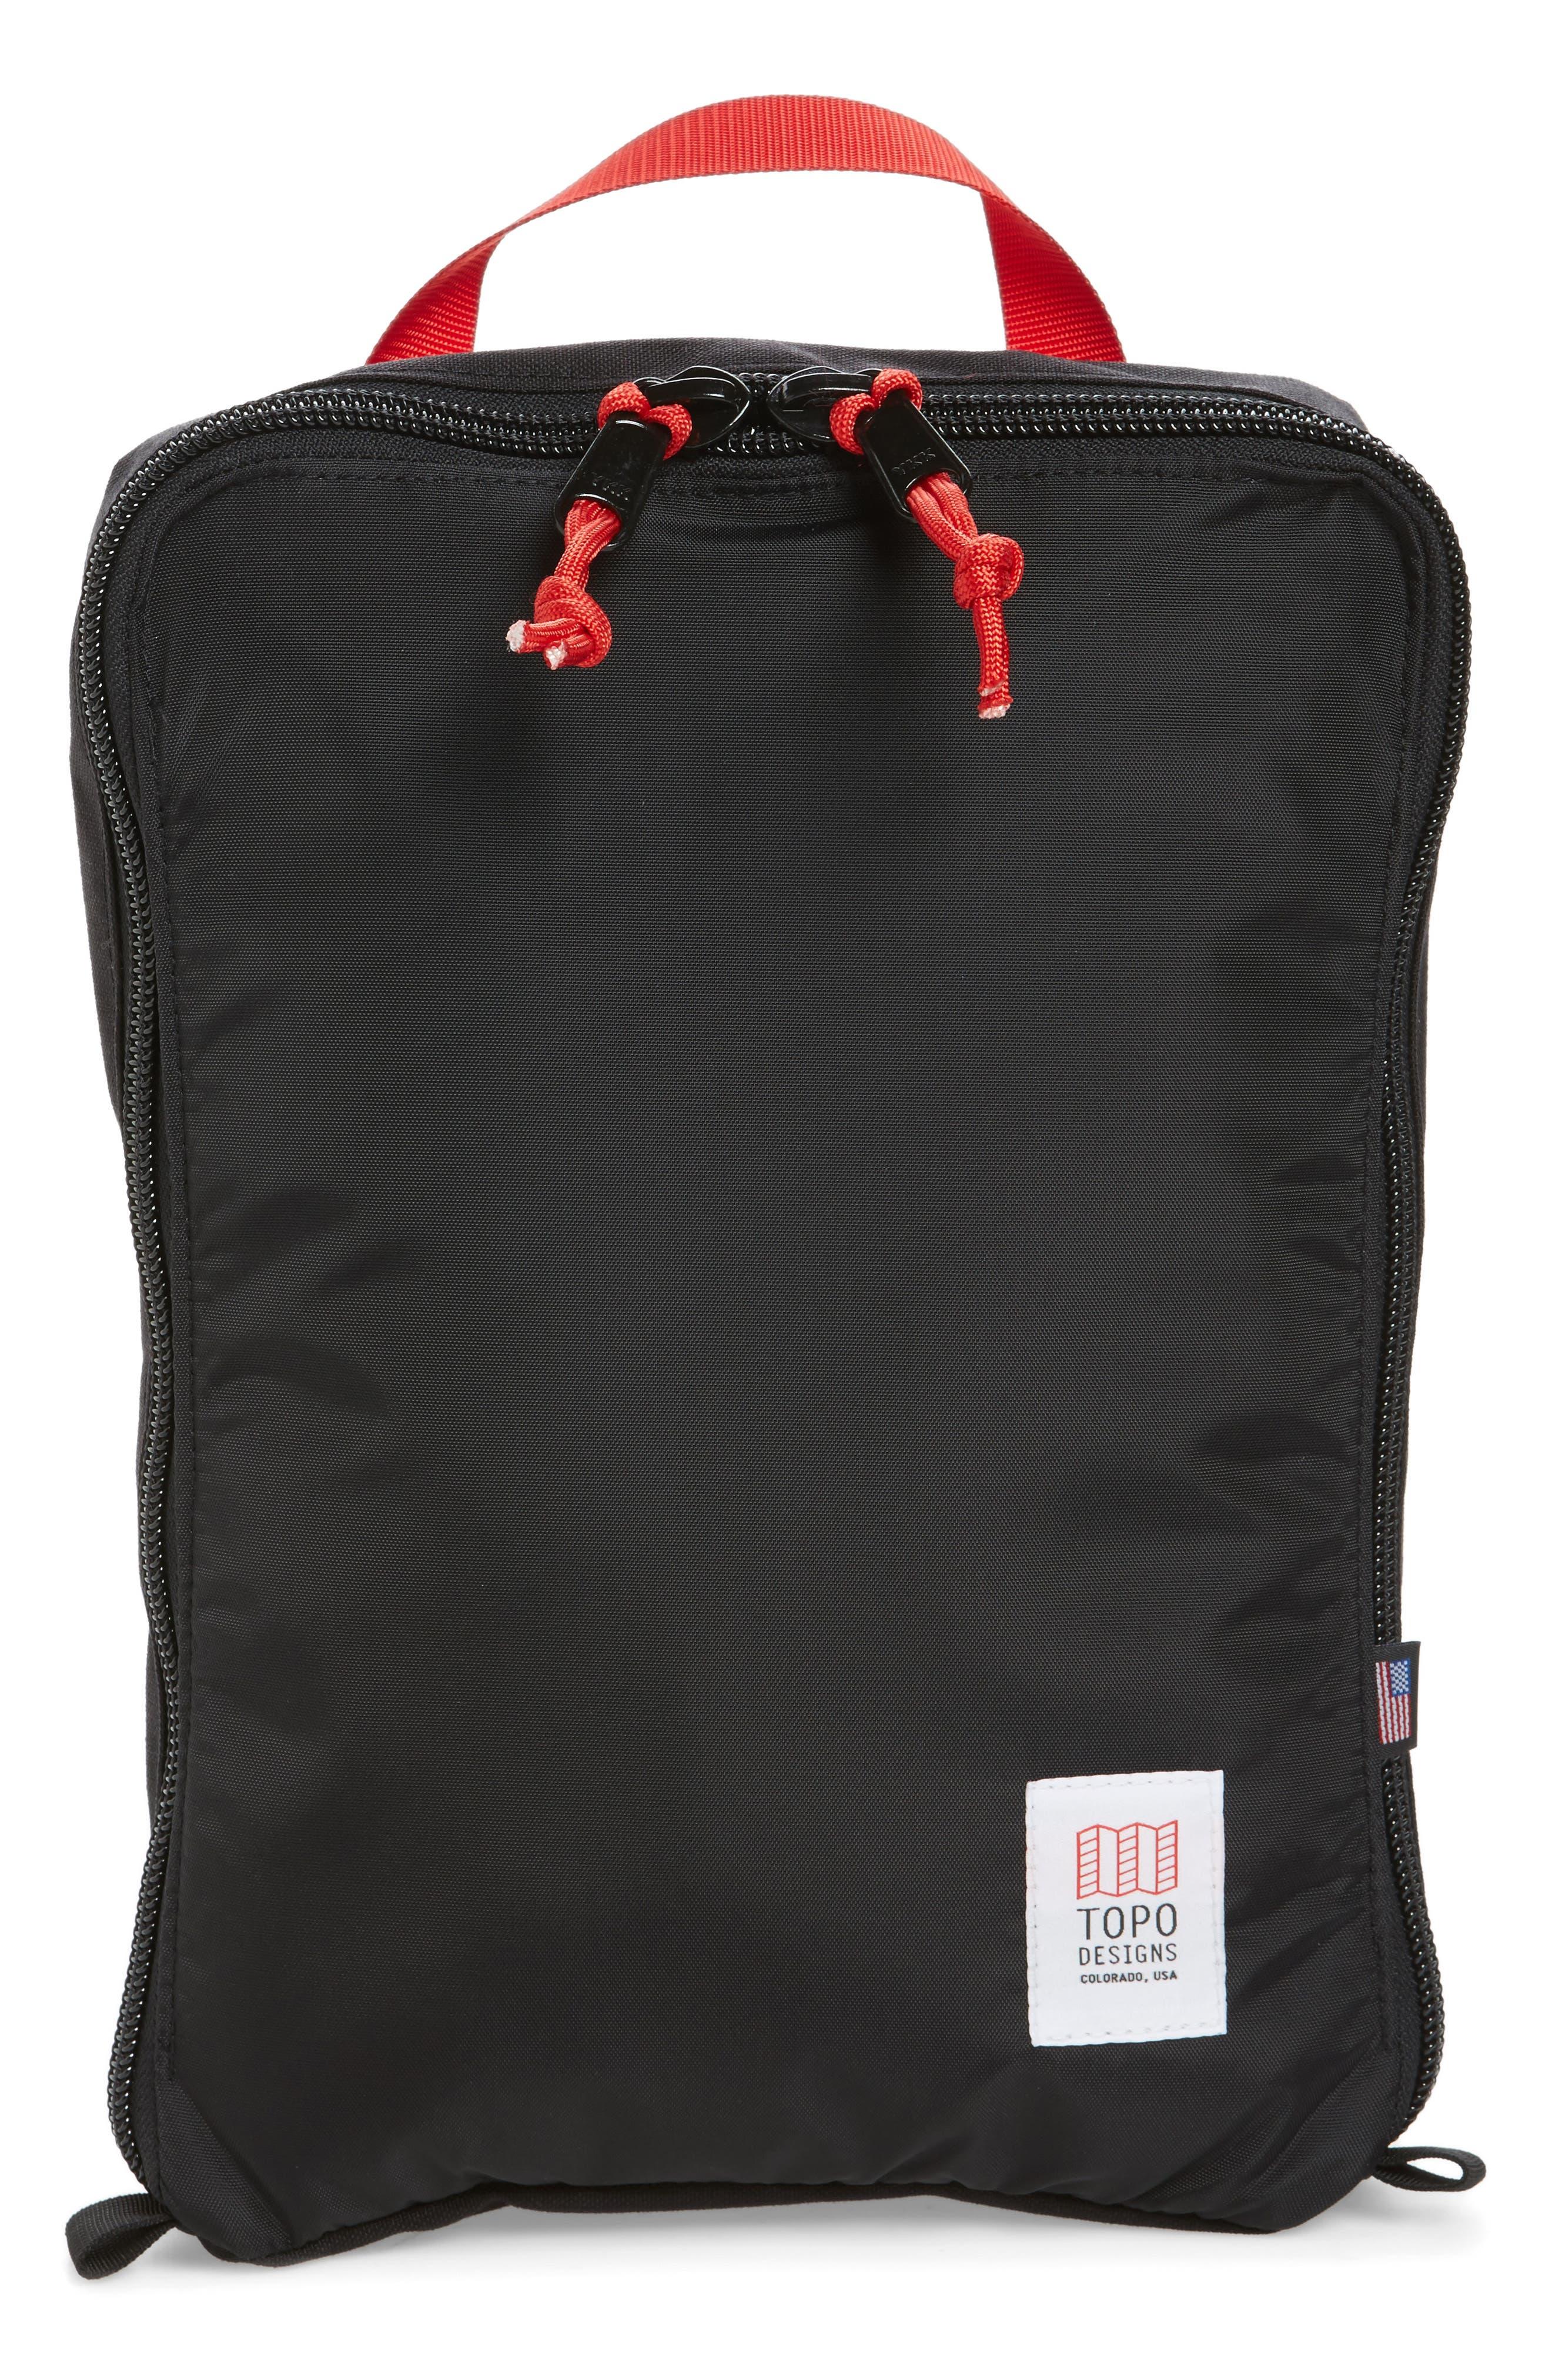 Alternate Image 1 Selected - Topo Designs Pack Bags Tote